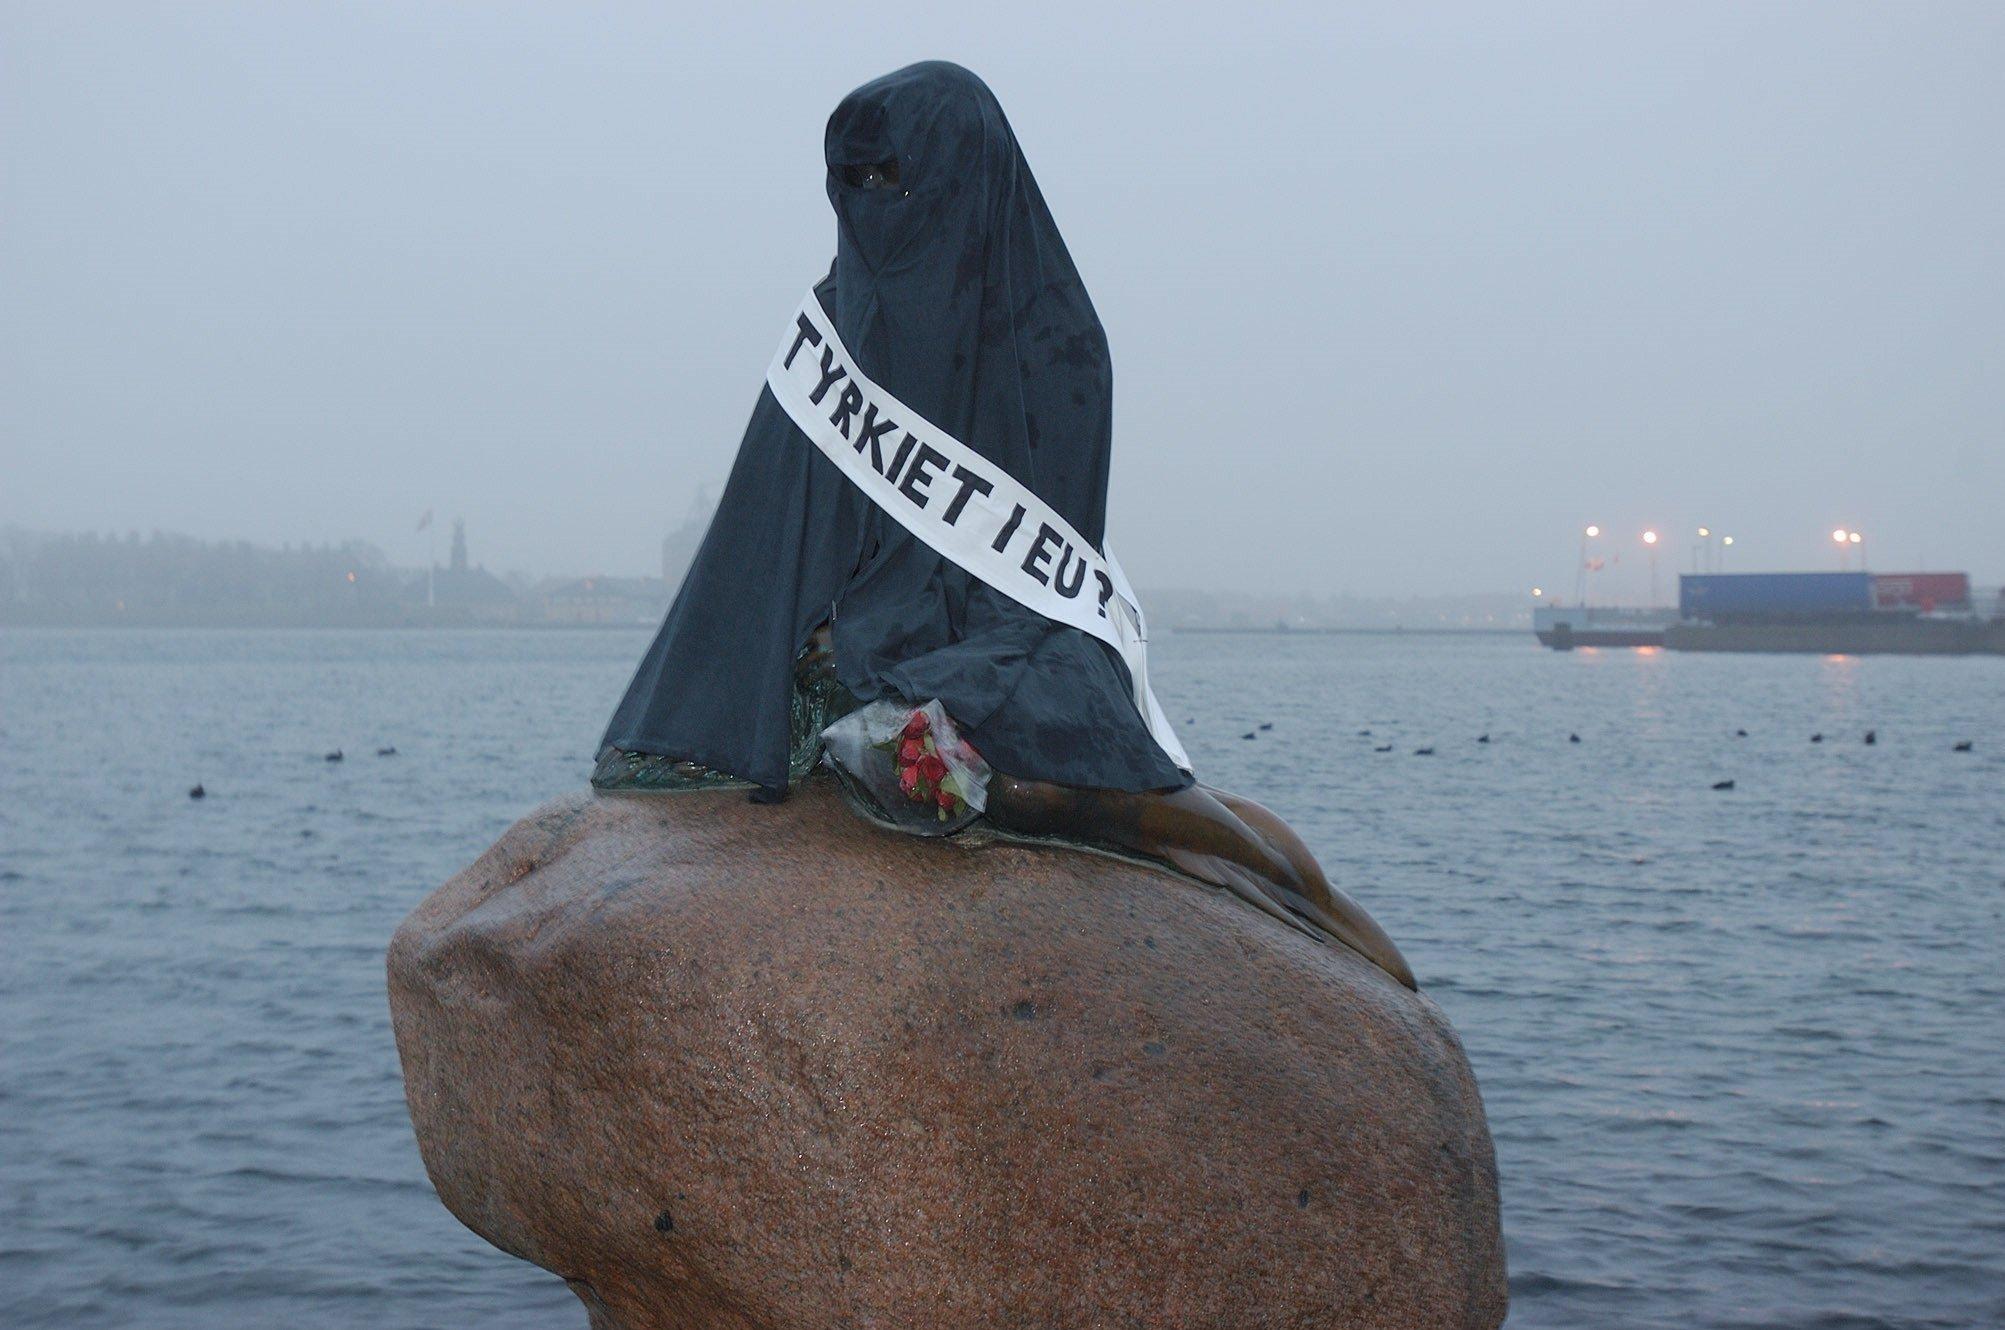 La Petite Sirène recouverte d'une burqa